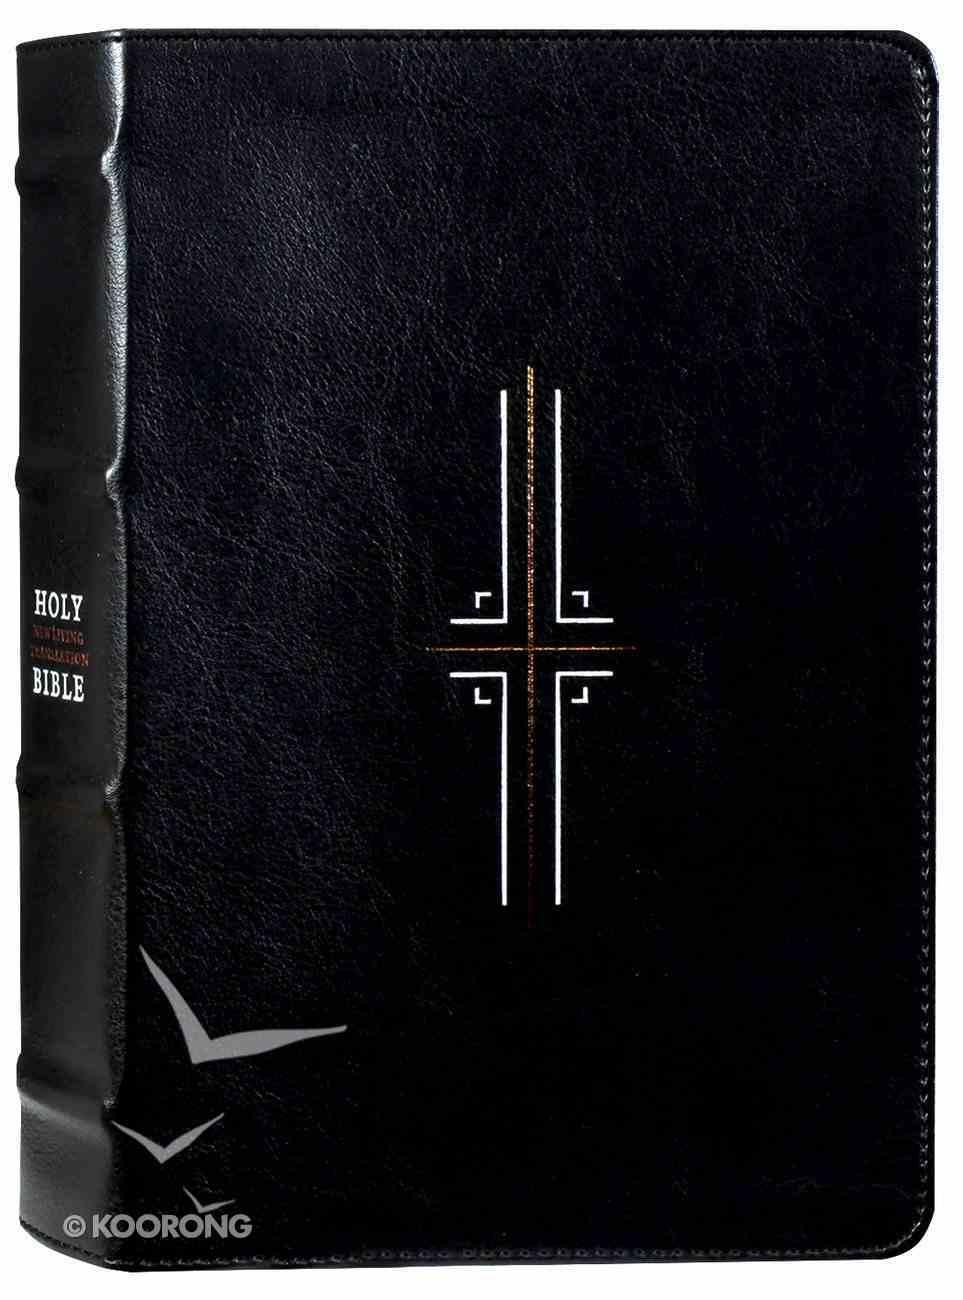 NLT Filament Bible Black (Black Letter Edition) (The Print+digital Bible) Imitation Leather